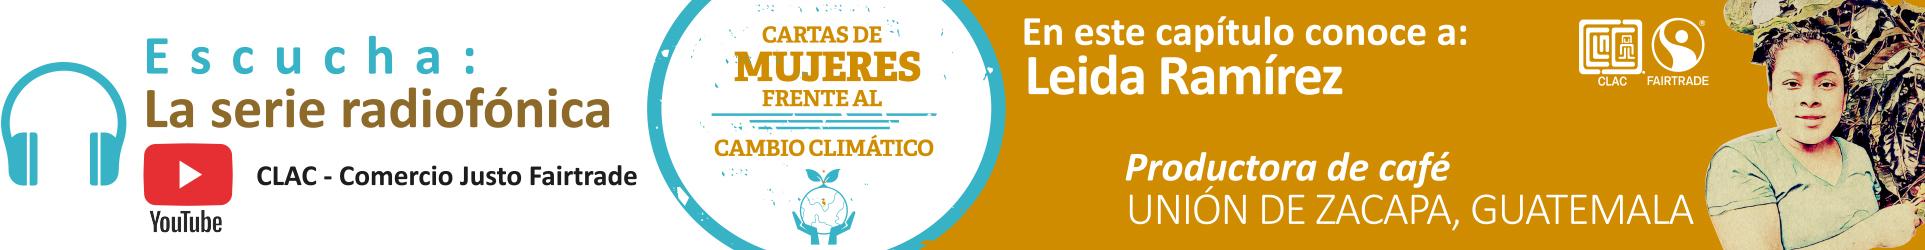 Leida Ramirez